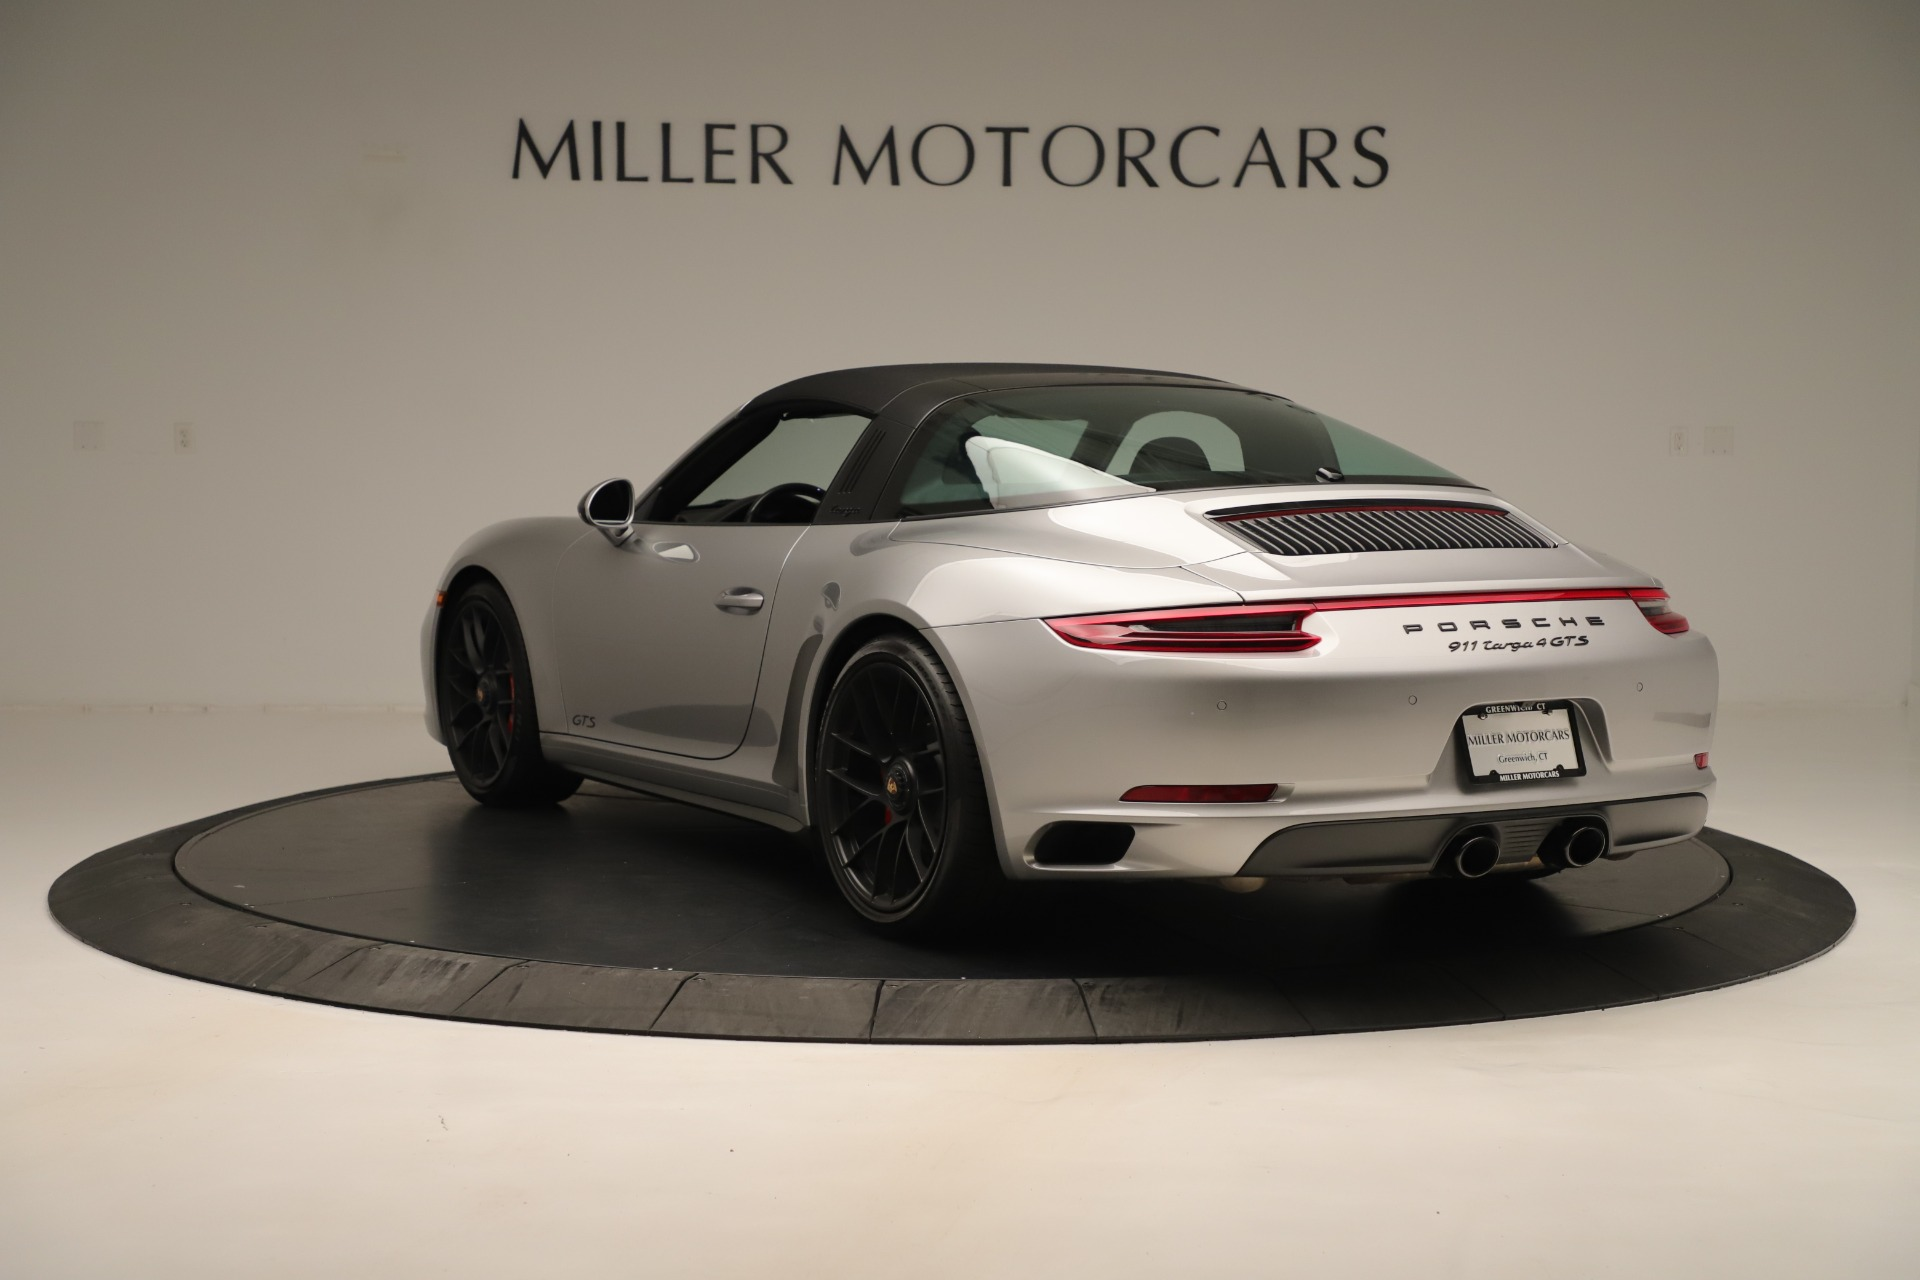 Used 2017 Porsche 911 Targa 4 GTS For Sale In Greenwich, CT 3374_p13